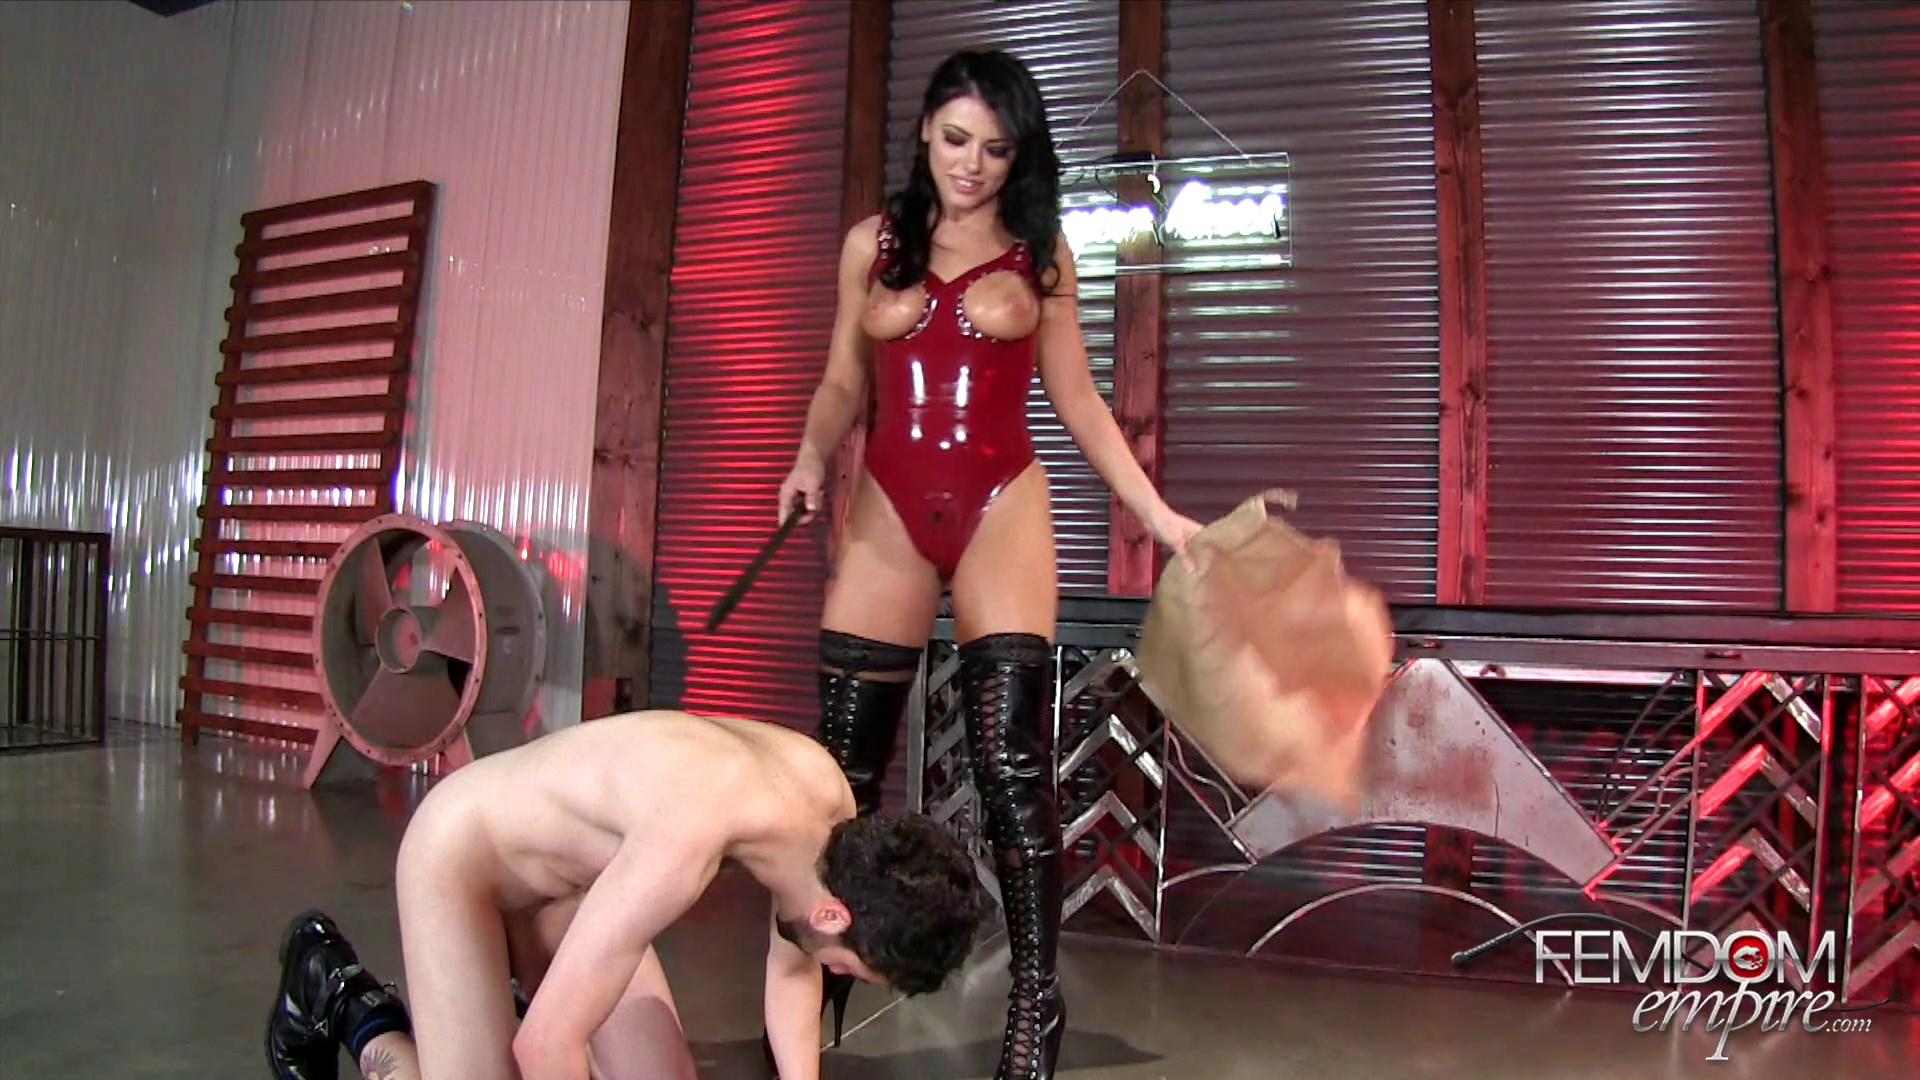 Wild hardcore homemade painful asian porn